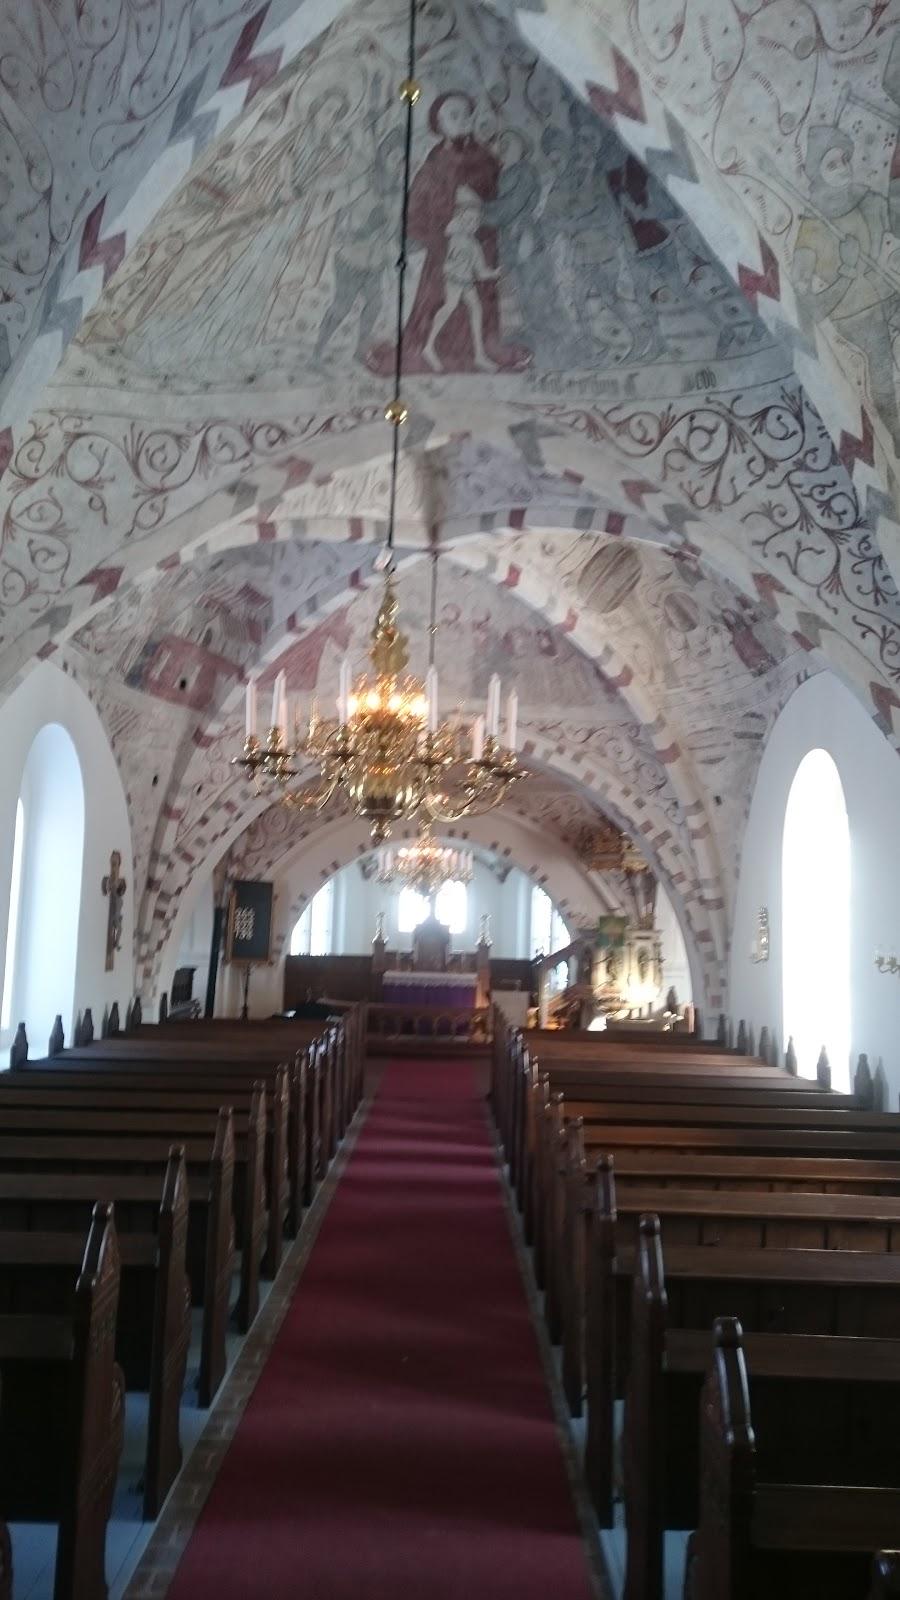 Silvåkra kyrka